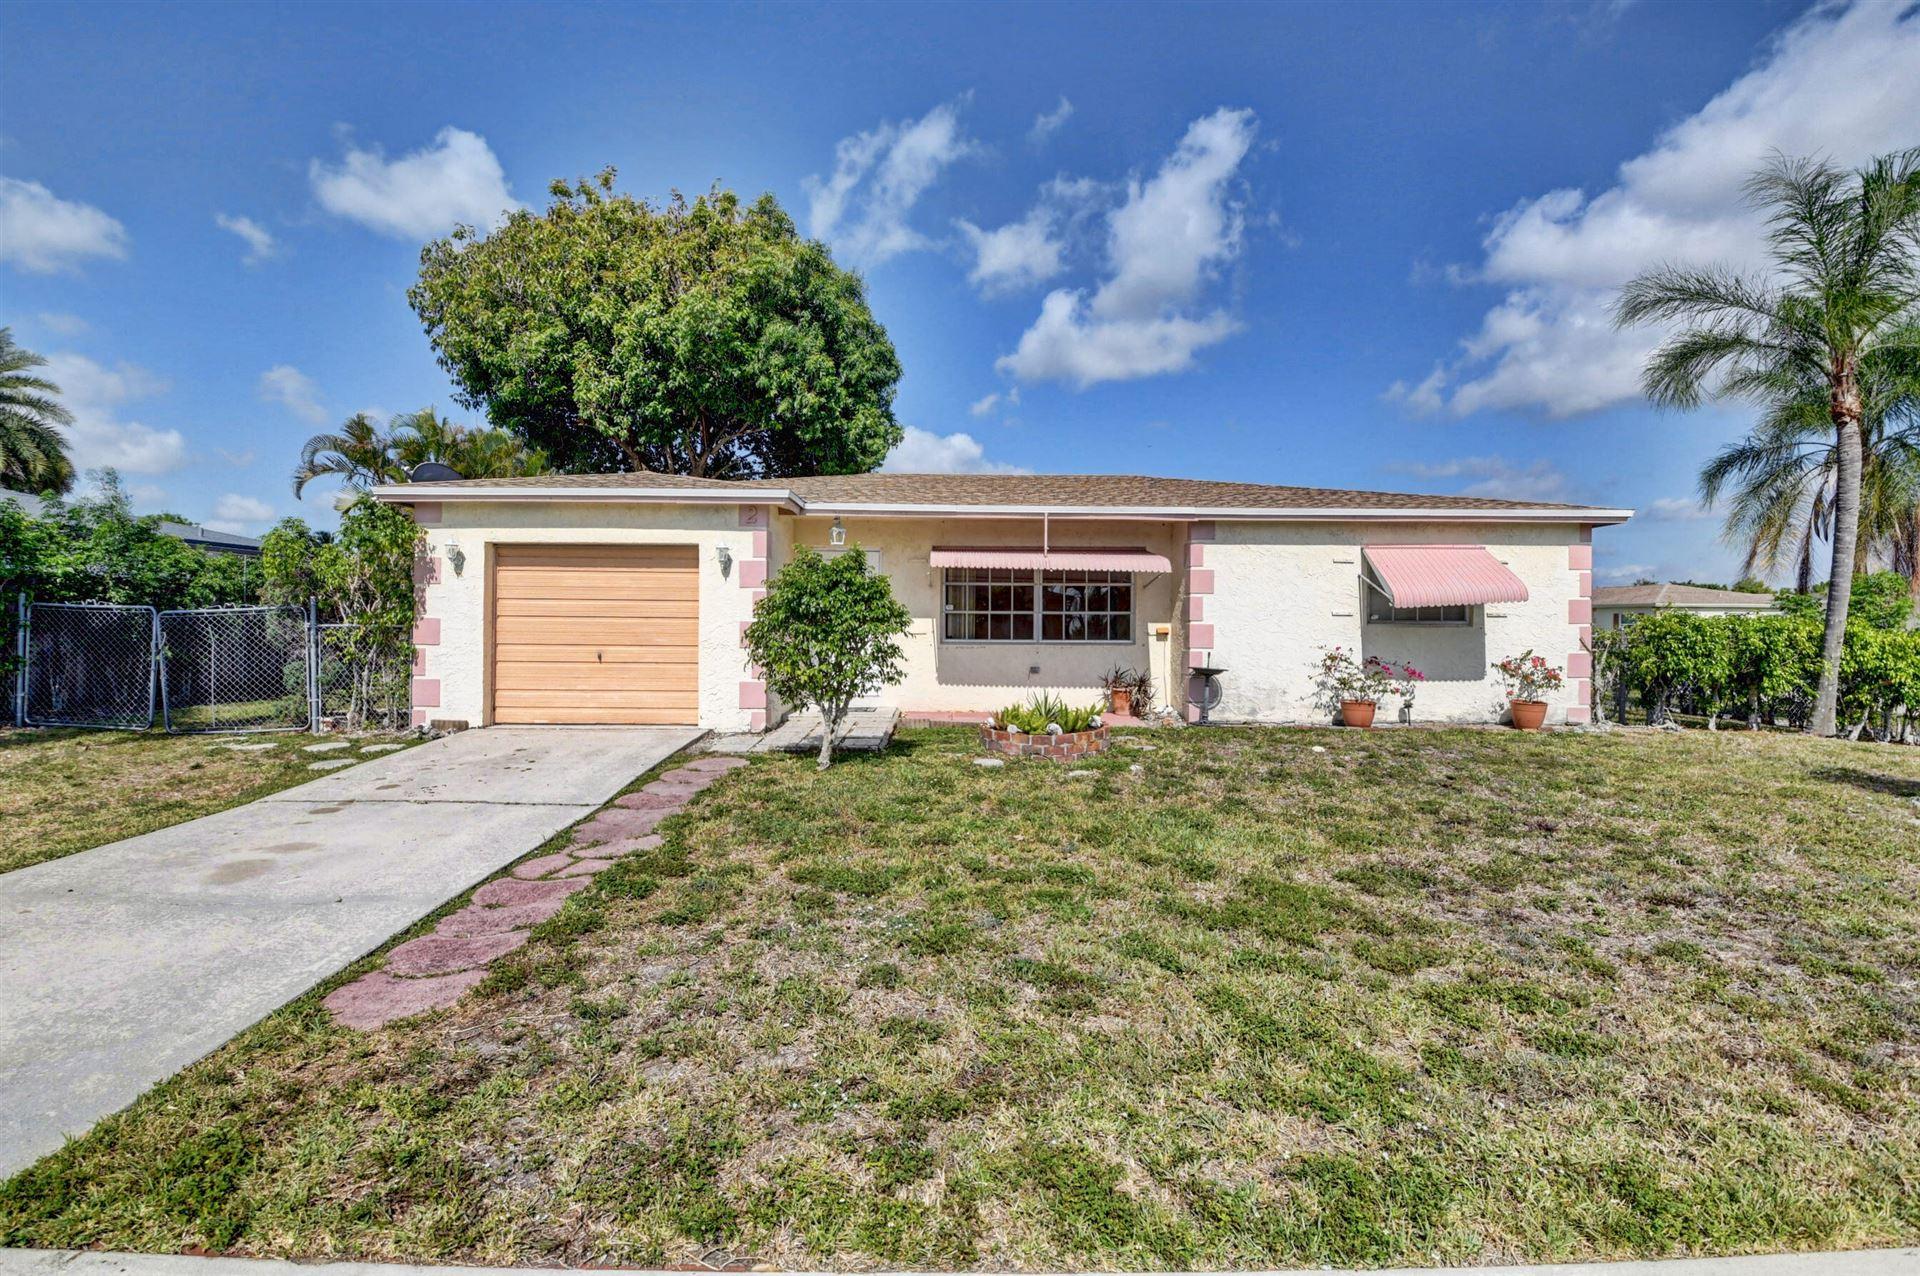 21525 Crozier Avenue, Boca Raton, FL 33428 - MLS#: RX-10714502